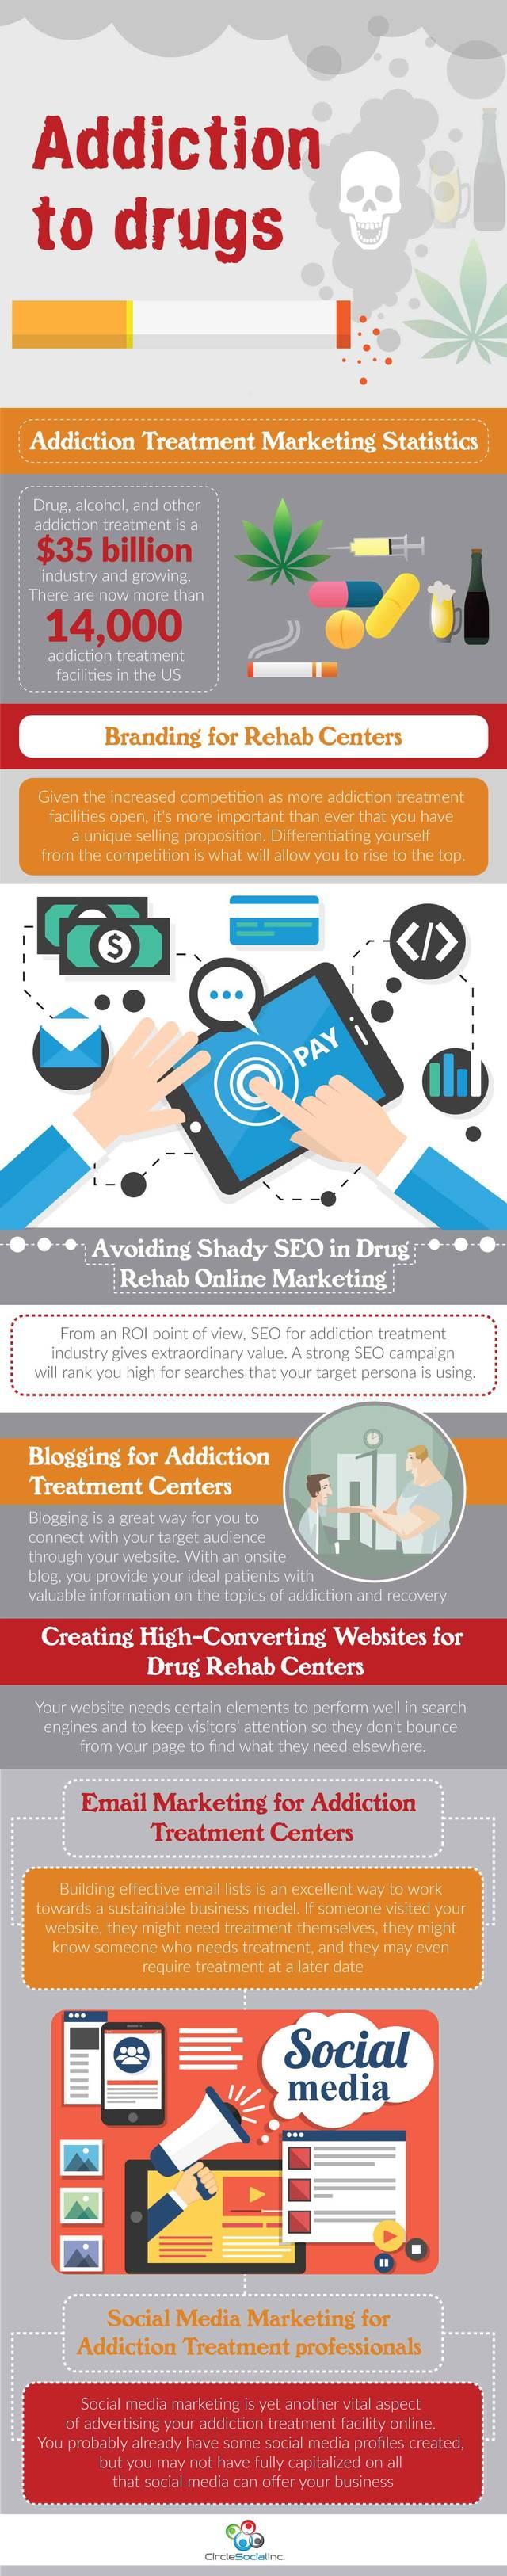 03 addiction to drugs